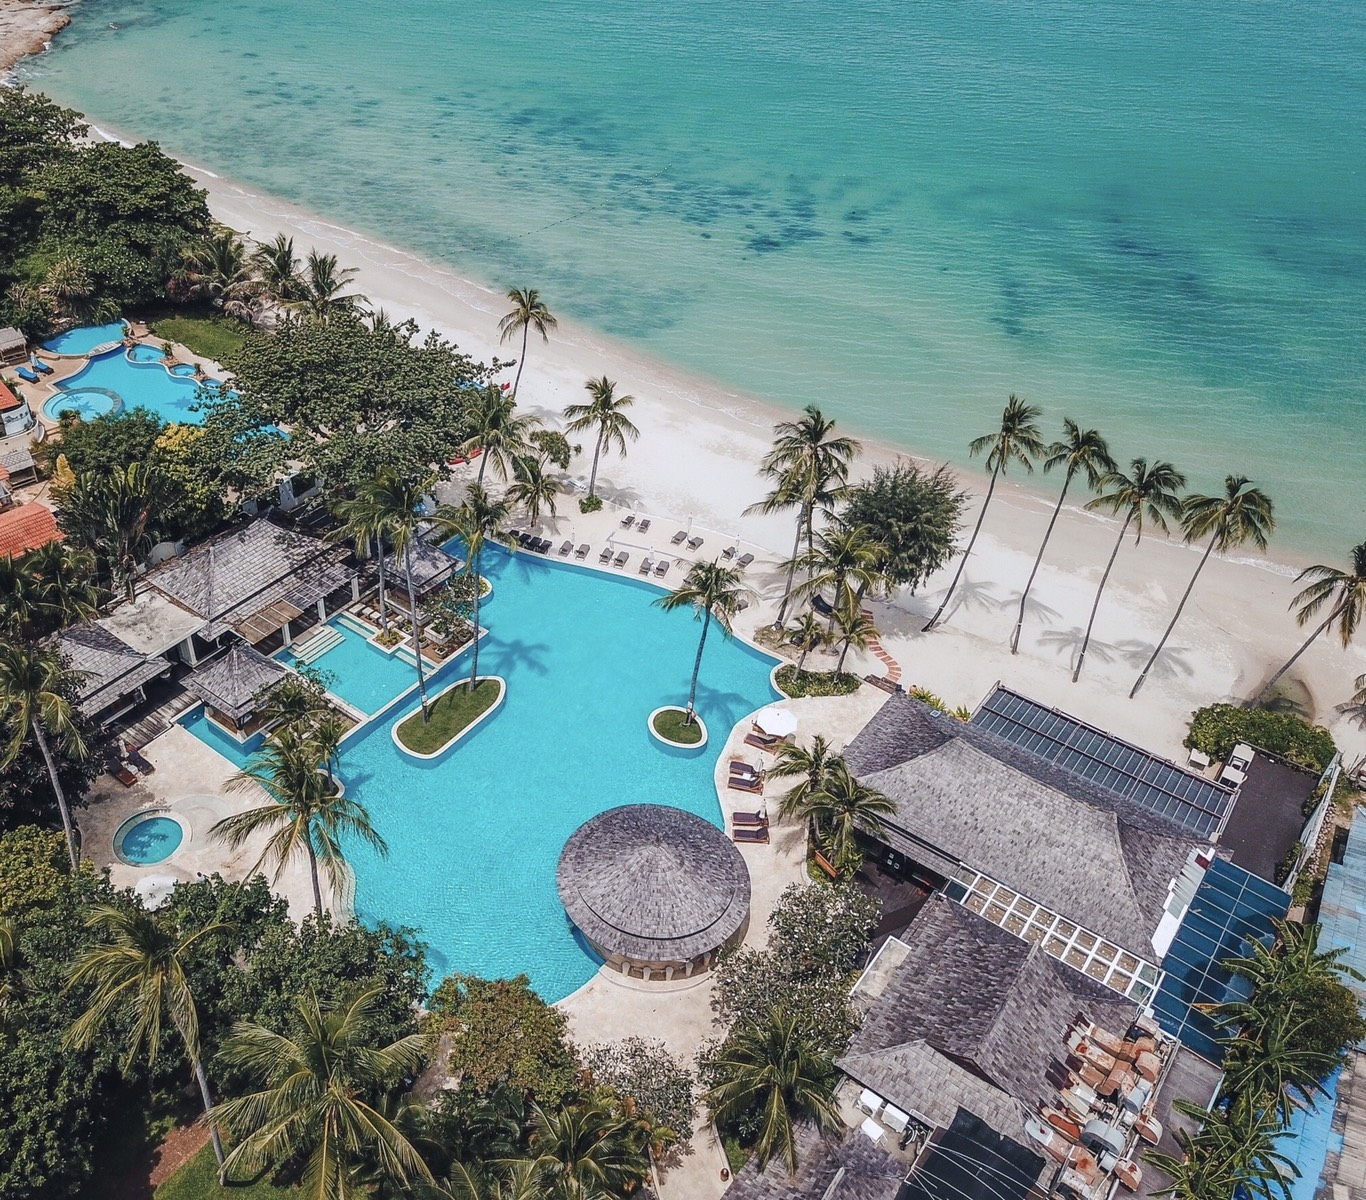 G15 Melati Beach Resort & Spa - Koh Samui